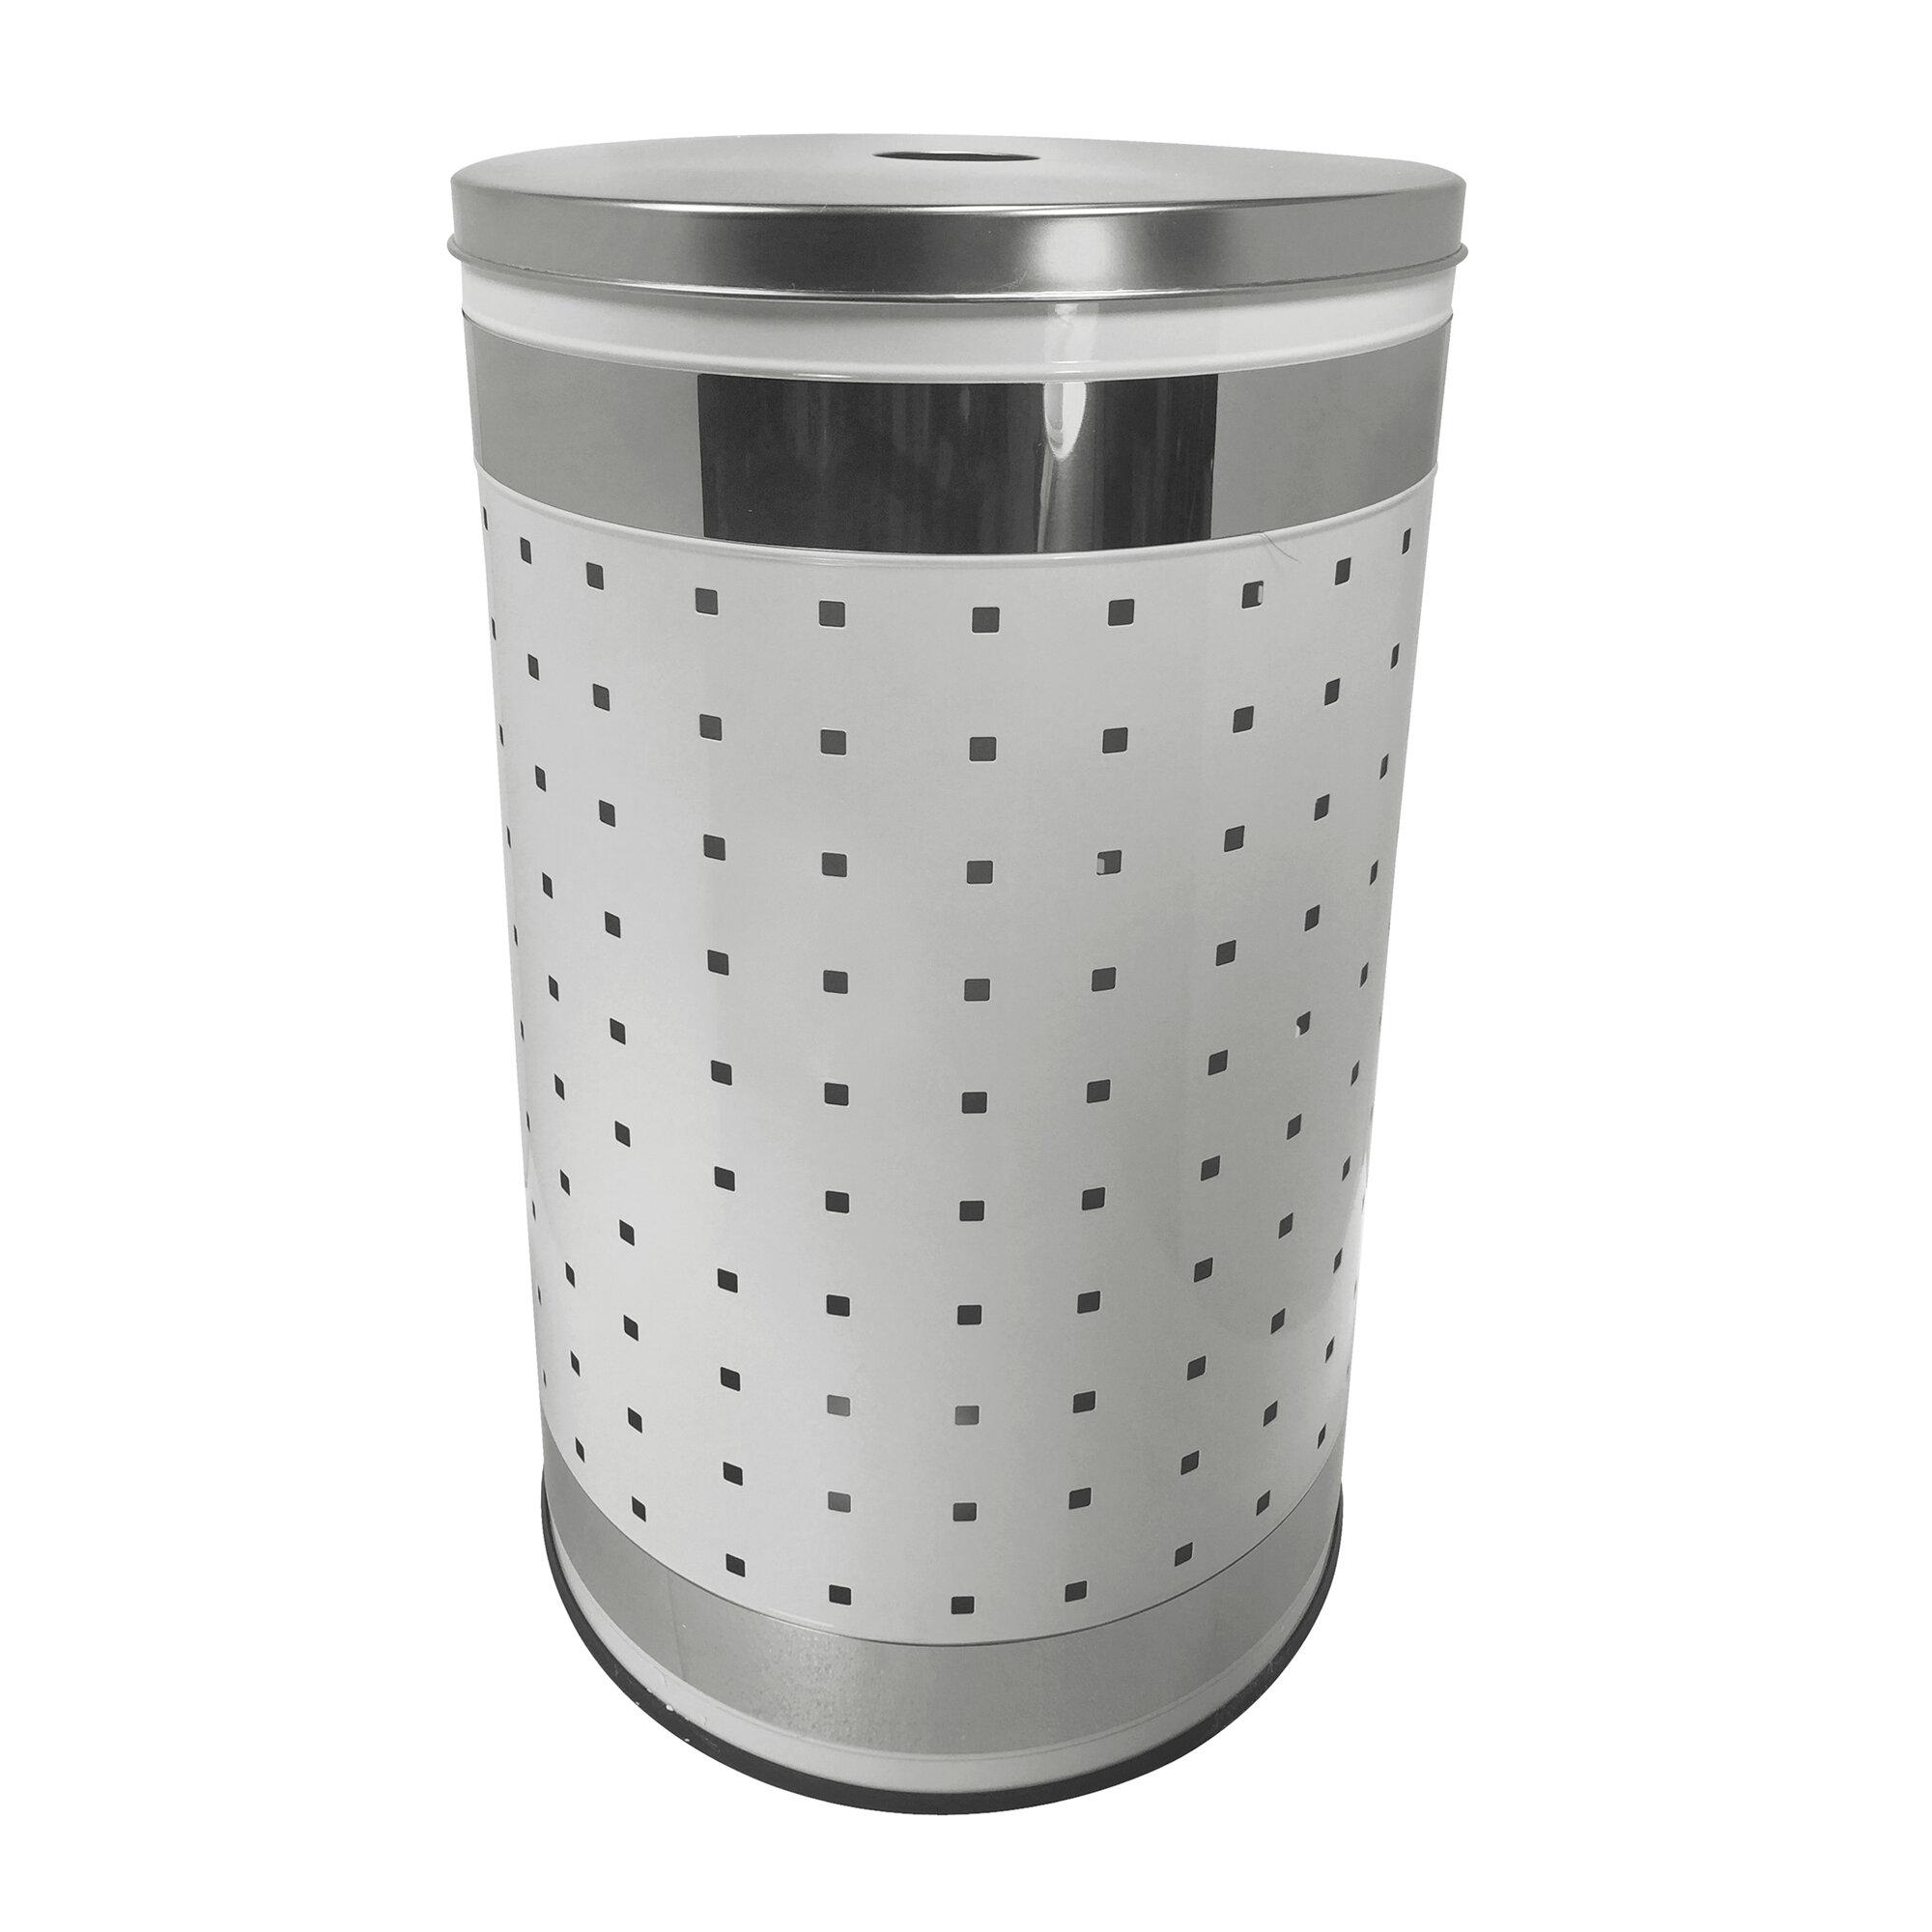 Orren Ellis Ventilated Stainless Steel Laundry Hamper And Clothes Basket Wayfair